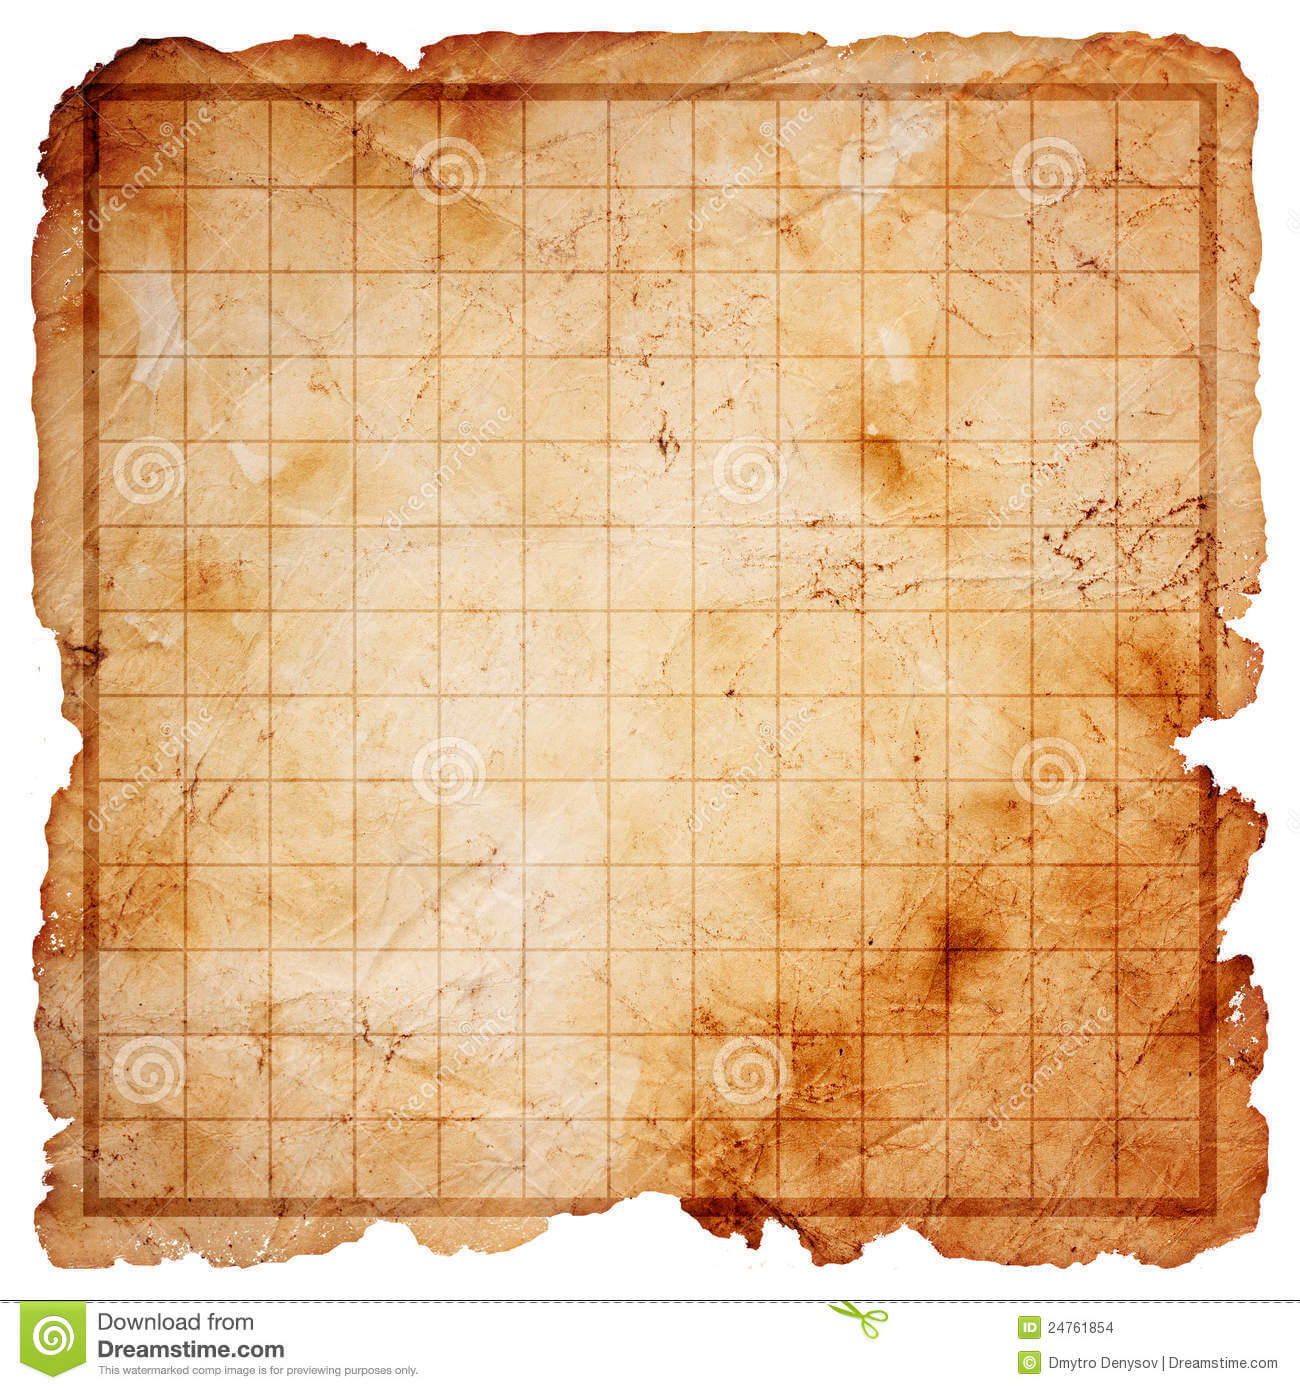 Blank Treasure Map Clipart Regarding Blank Pirate Map Template